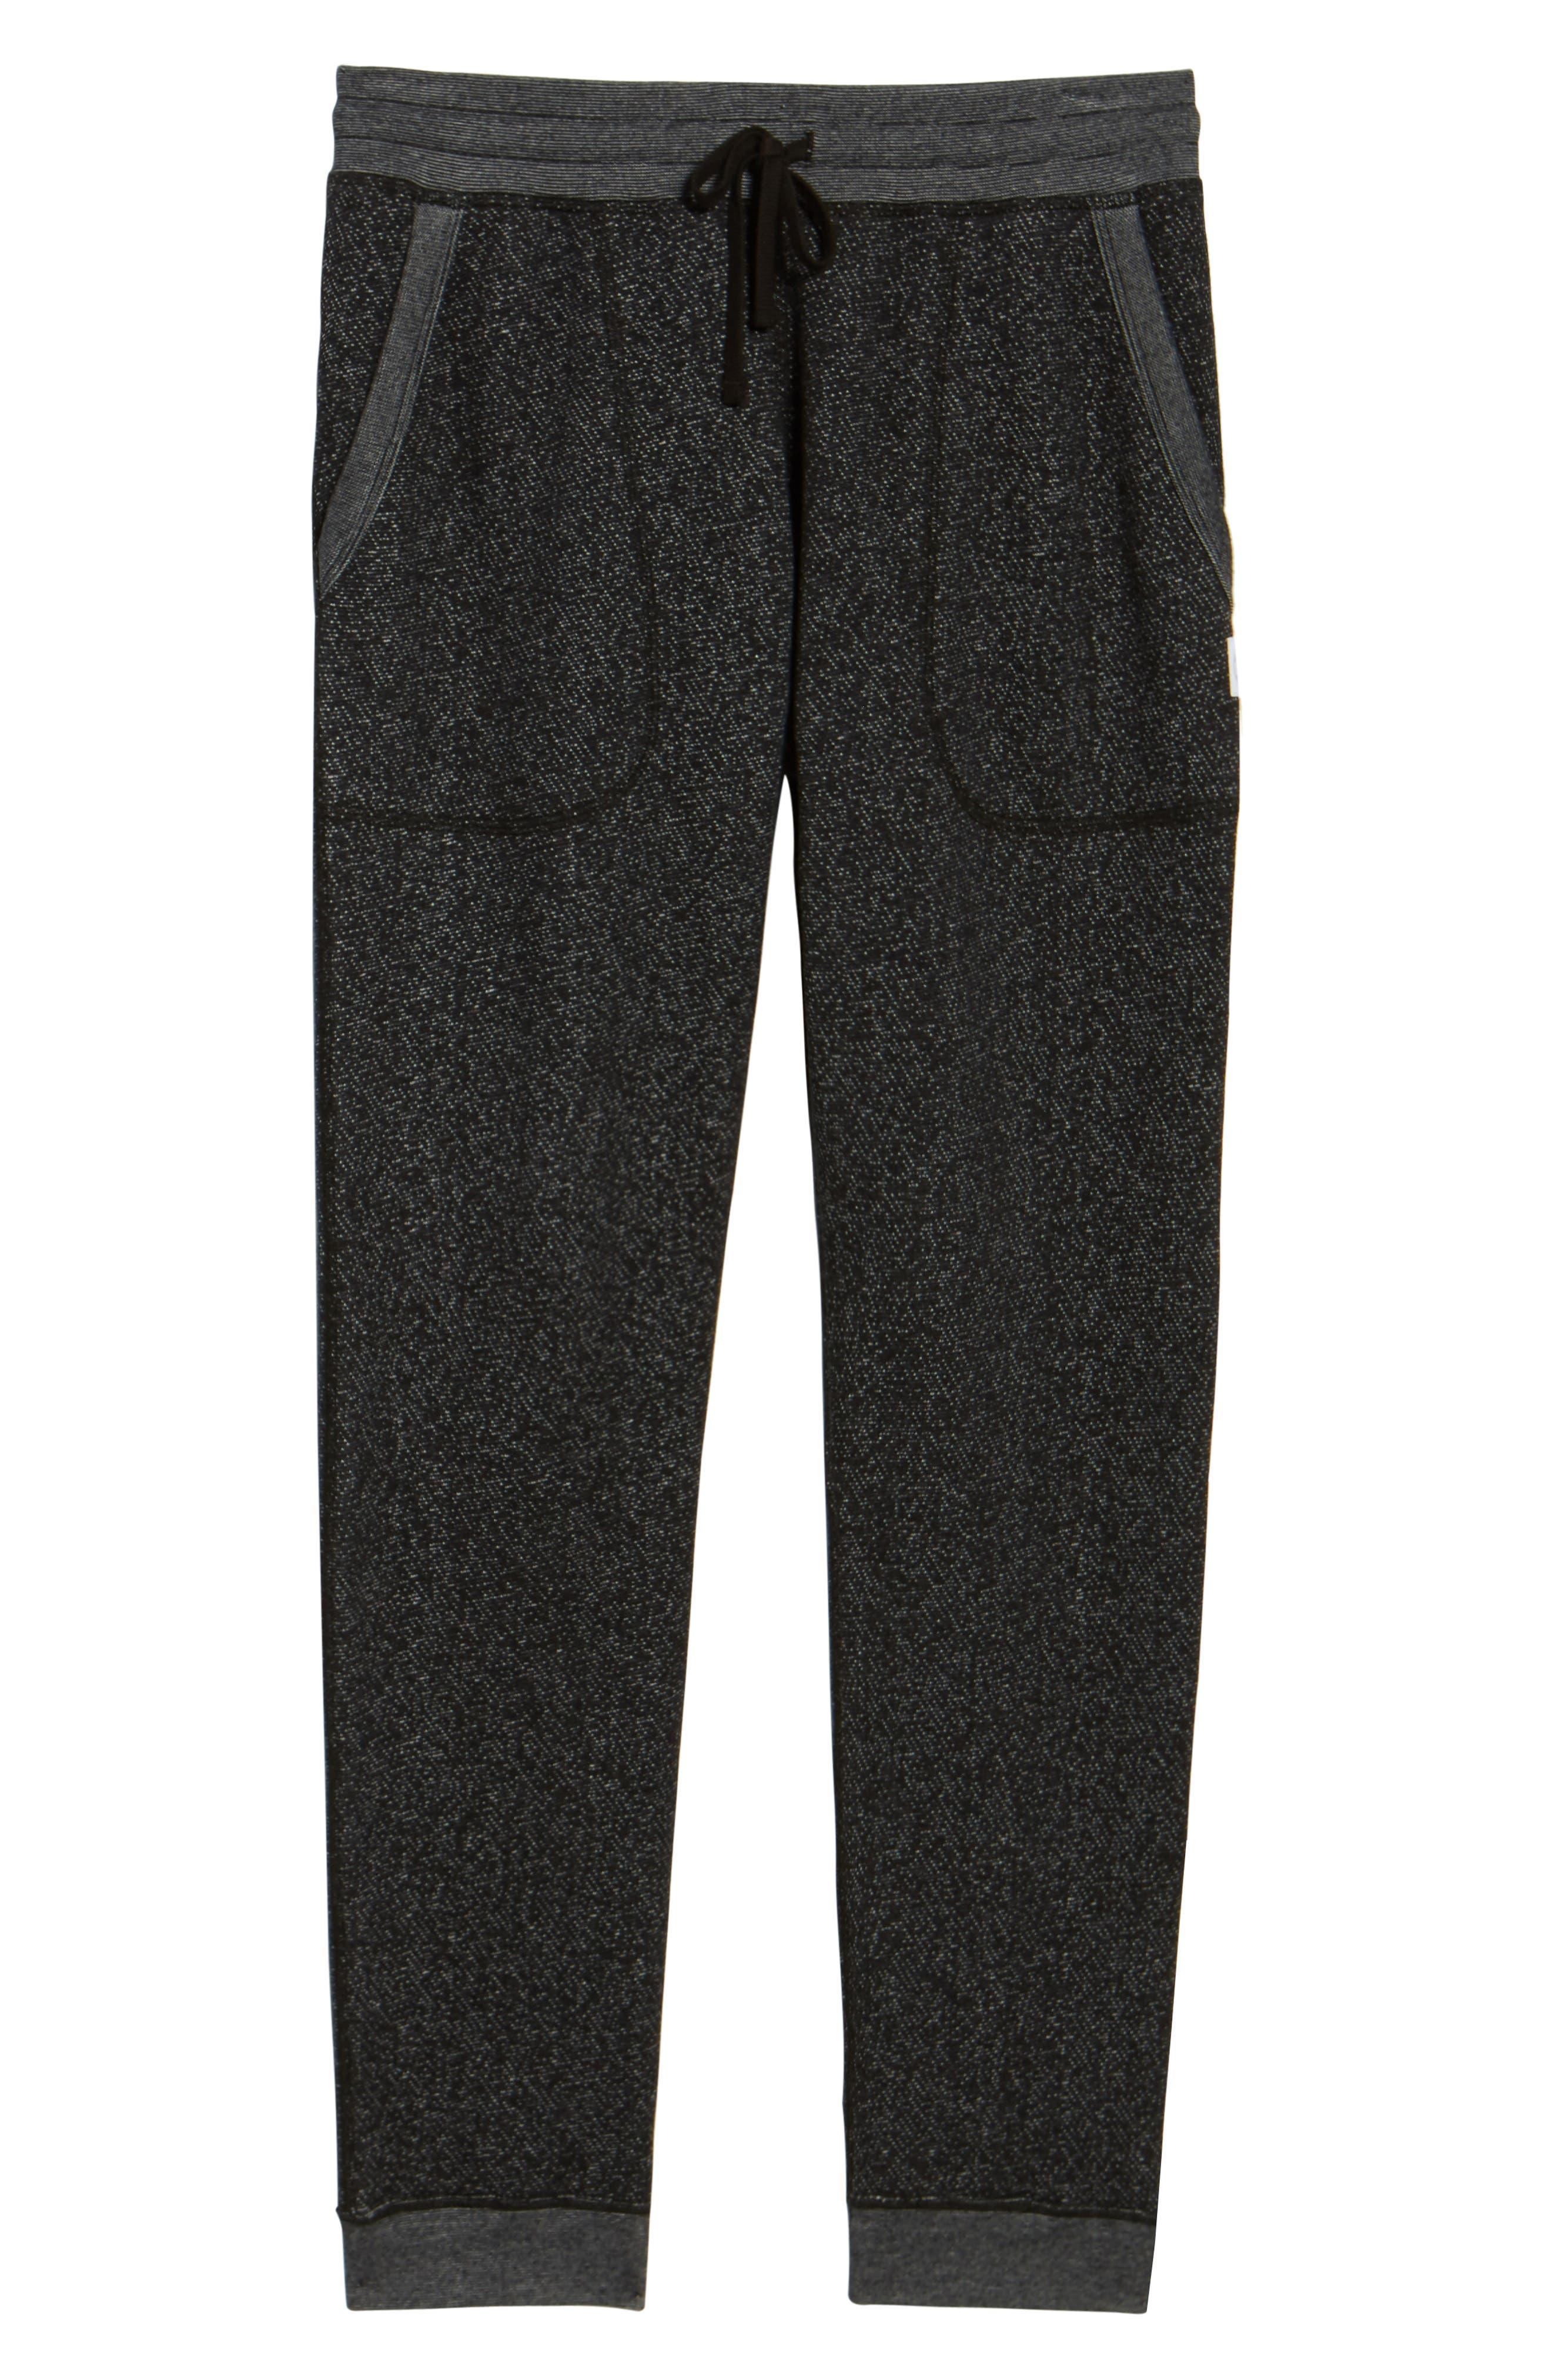 Tiger Slim Jogger Sweatpants,                             Alternate thumbnail 6, color,                             BLACK